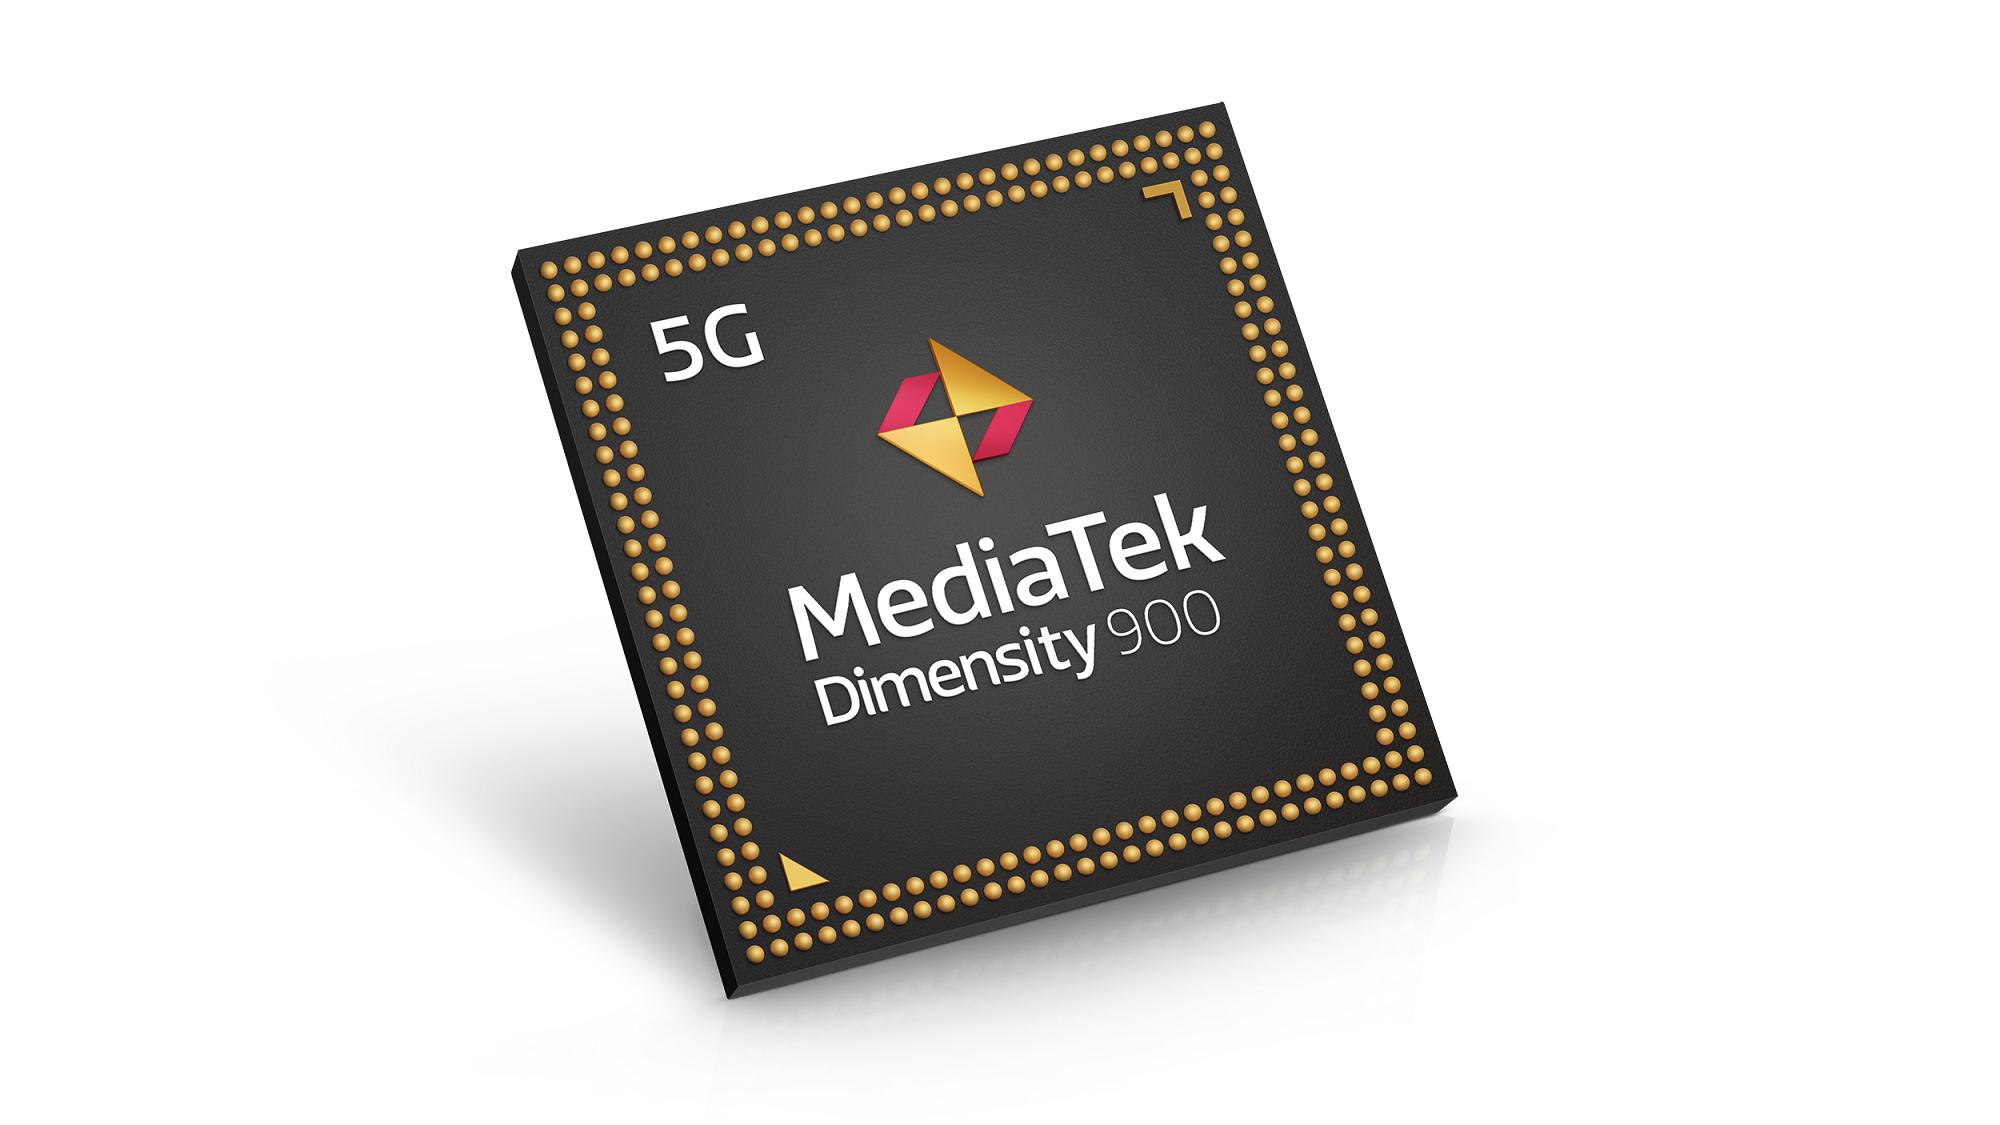 MediaTek Dimensity 900 5G SoC revealed, based on 6nm manufacturing process